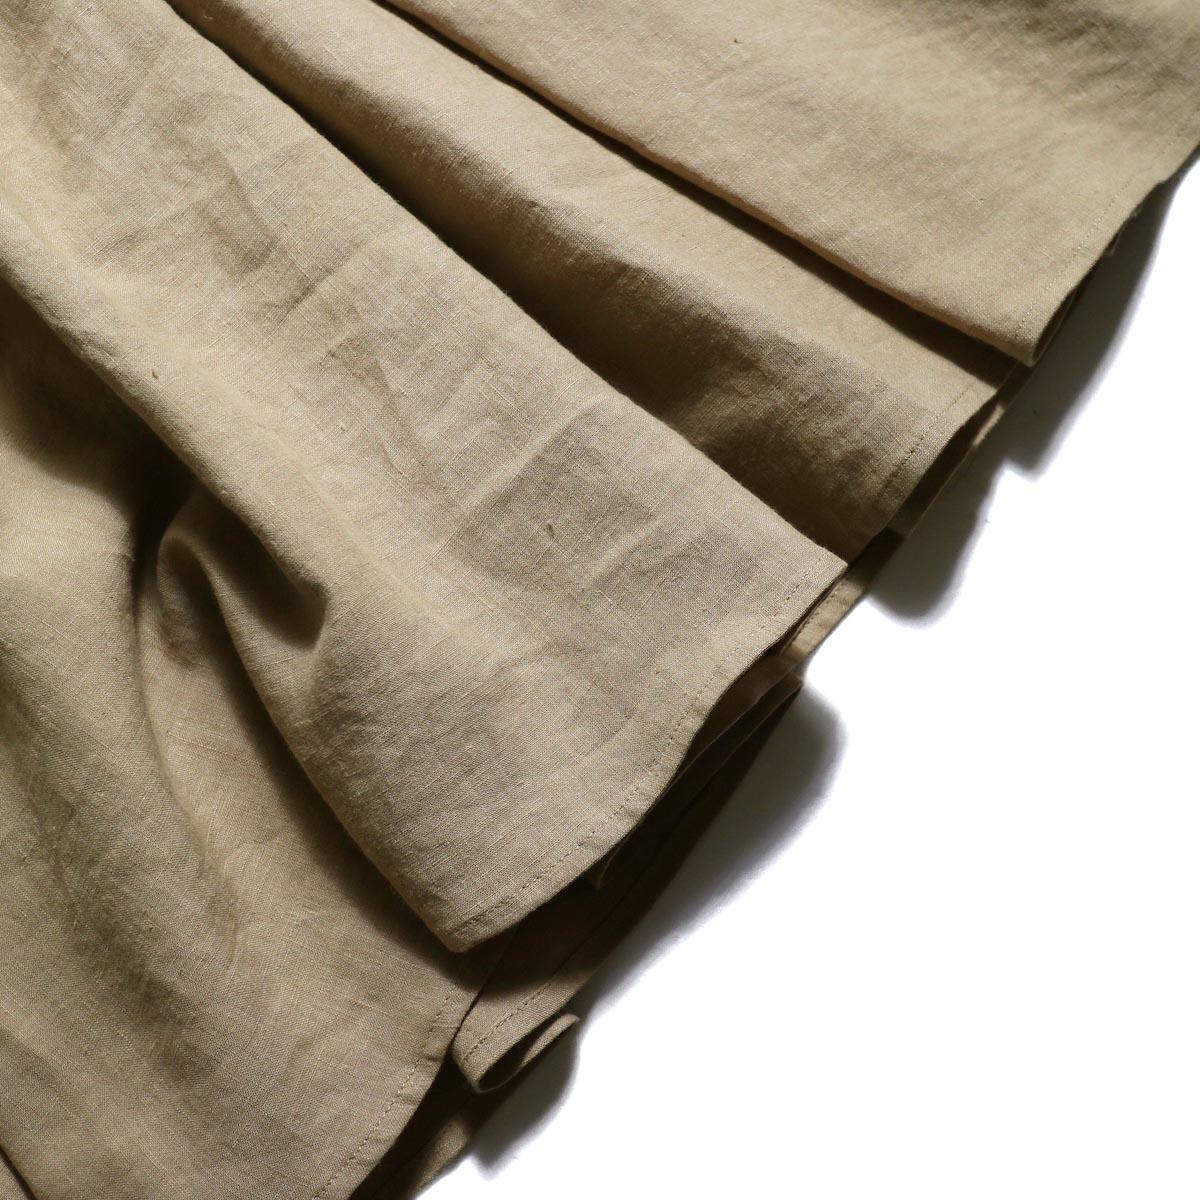 BLUEBIRD BOULEVARD / ヴィンテージリネンマキシドレス (Beige)裾